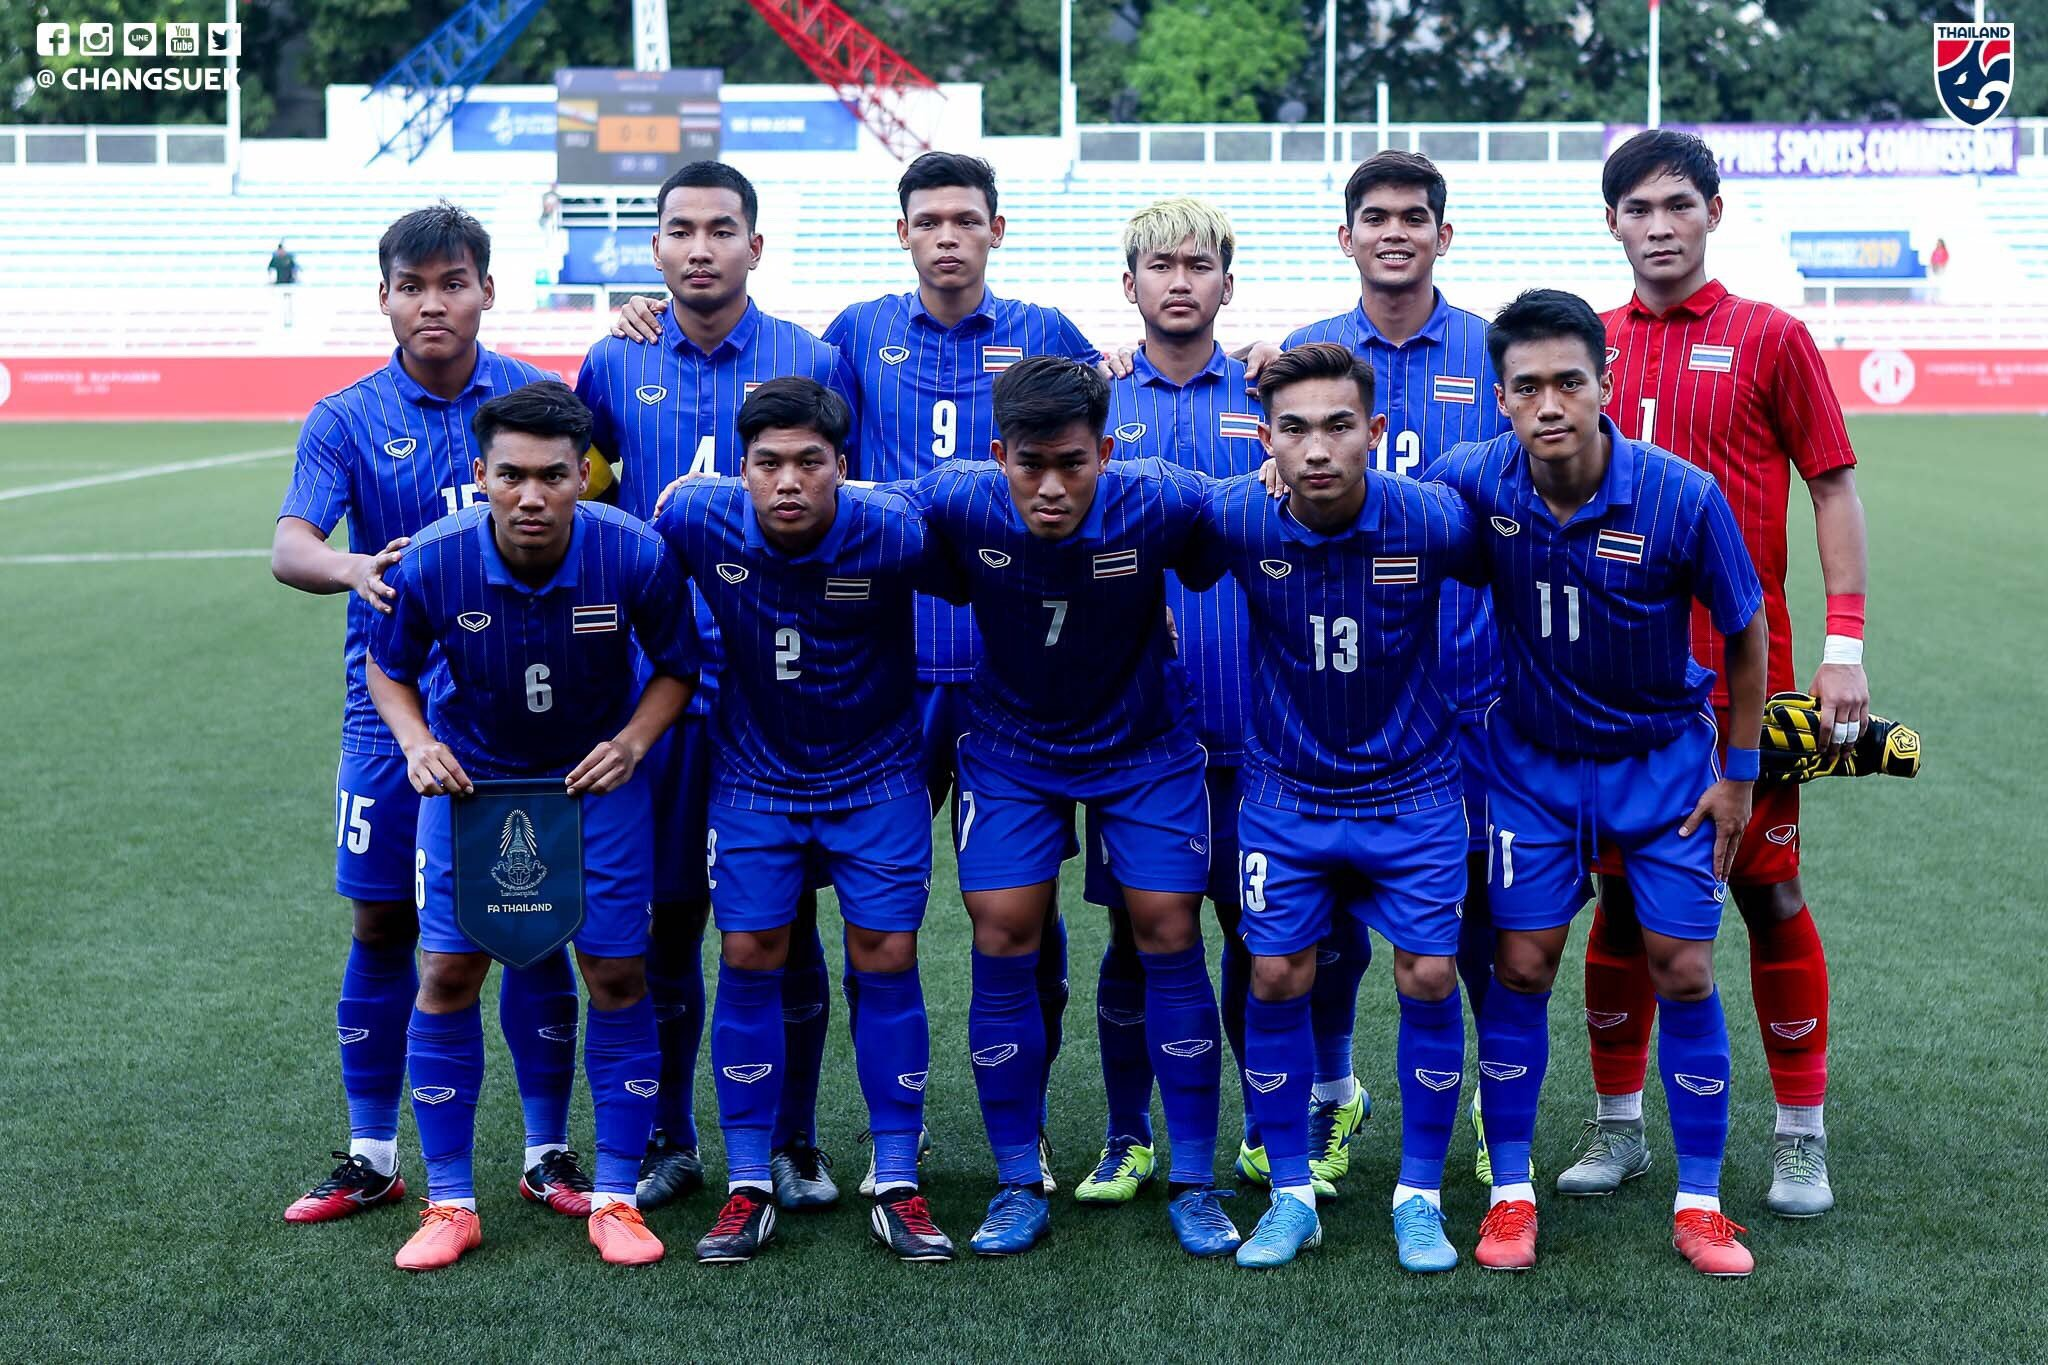 https: img.okeinfo.net content 2019 11 28 51 2135613 thailand-hajar-brunei-7-0-vietnam-sikat-laos-di-sea-games-2019-KrWx4qfU4X.jpg